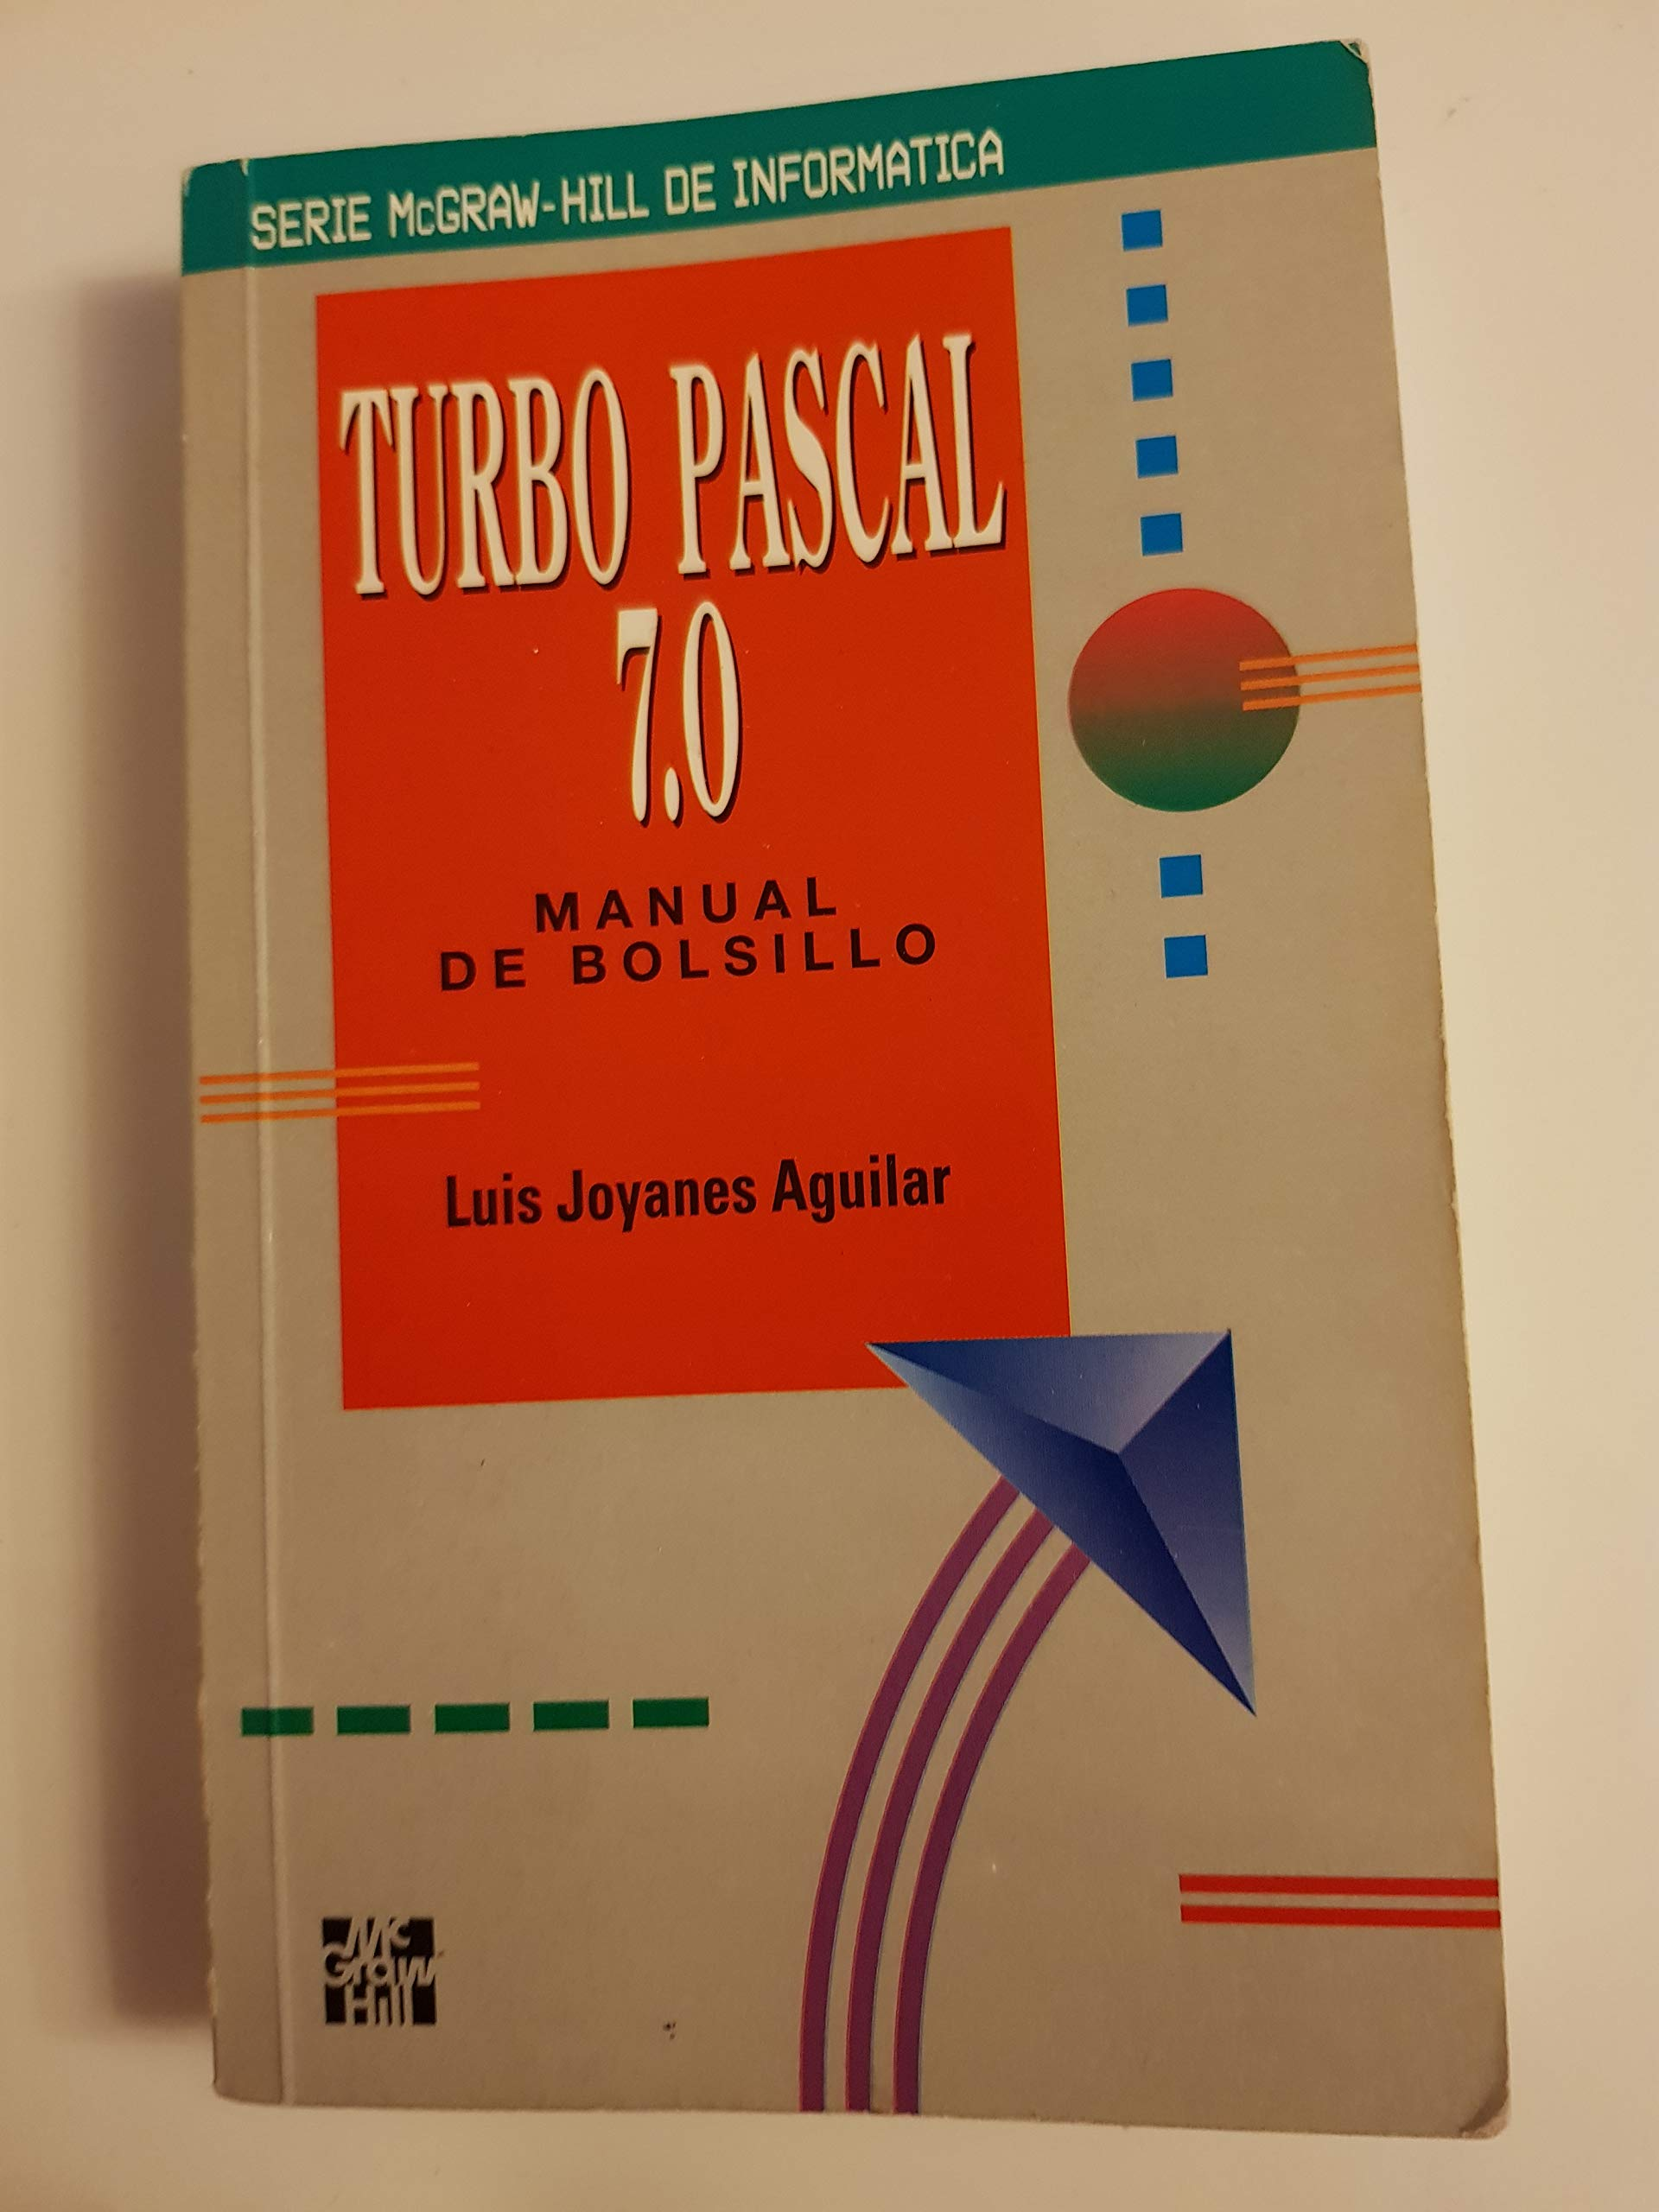 Turbo Pascal 7.0 - Manual de Bolsillo: Amazon.es: Luis Joyanes Aguilar: Libros